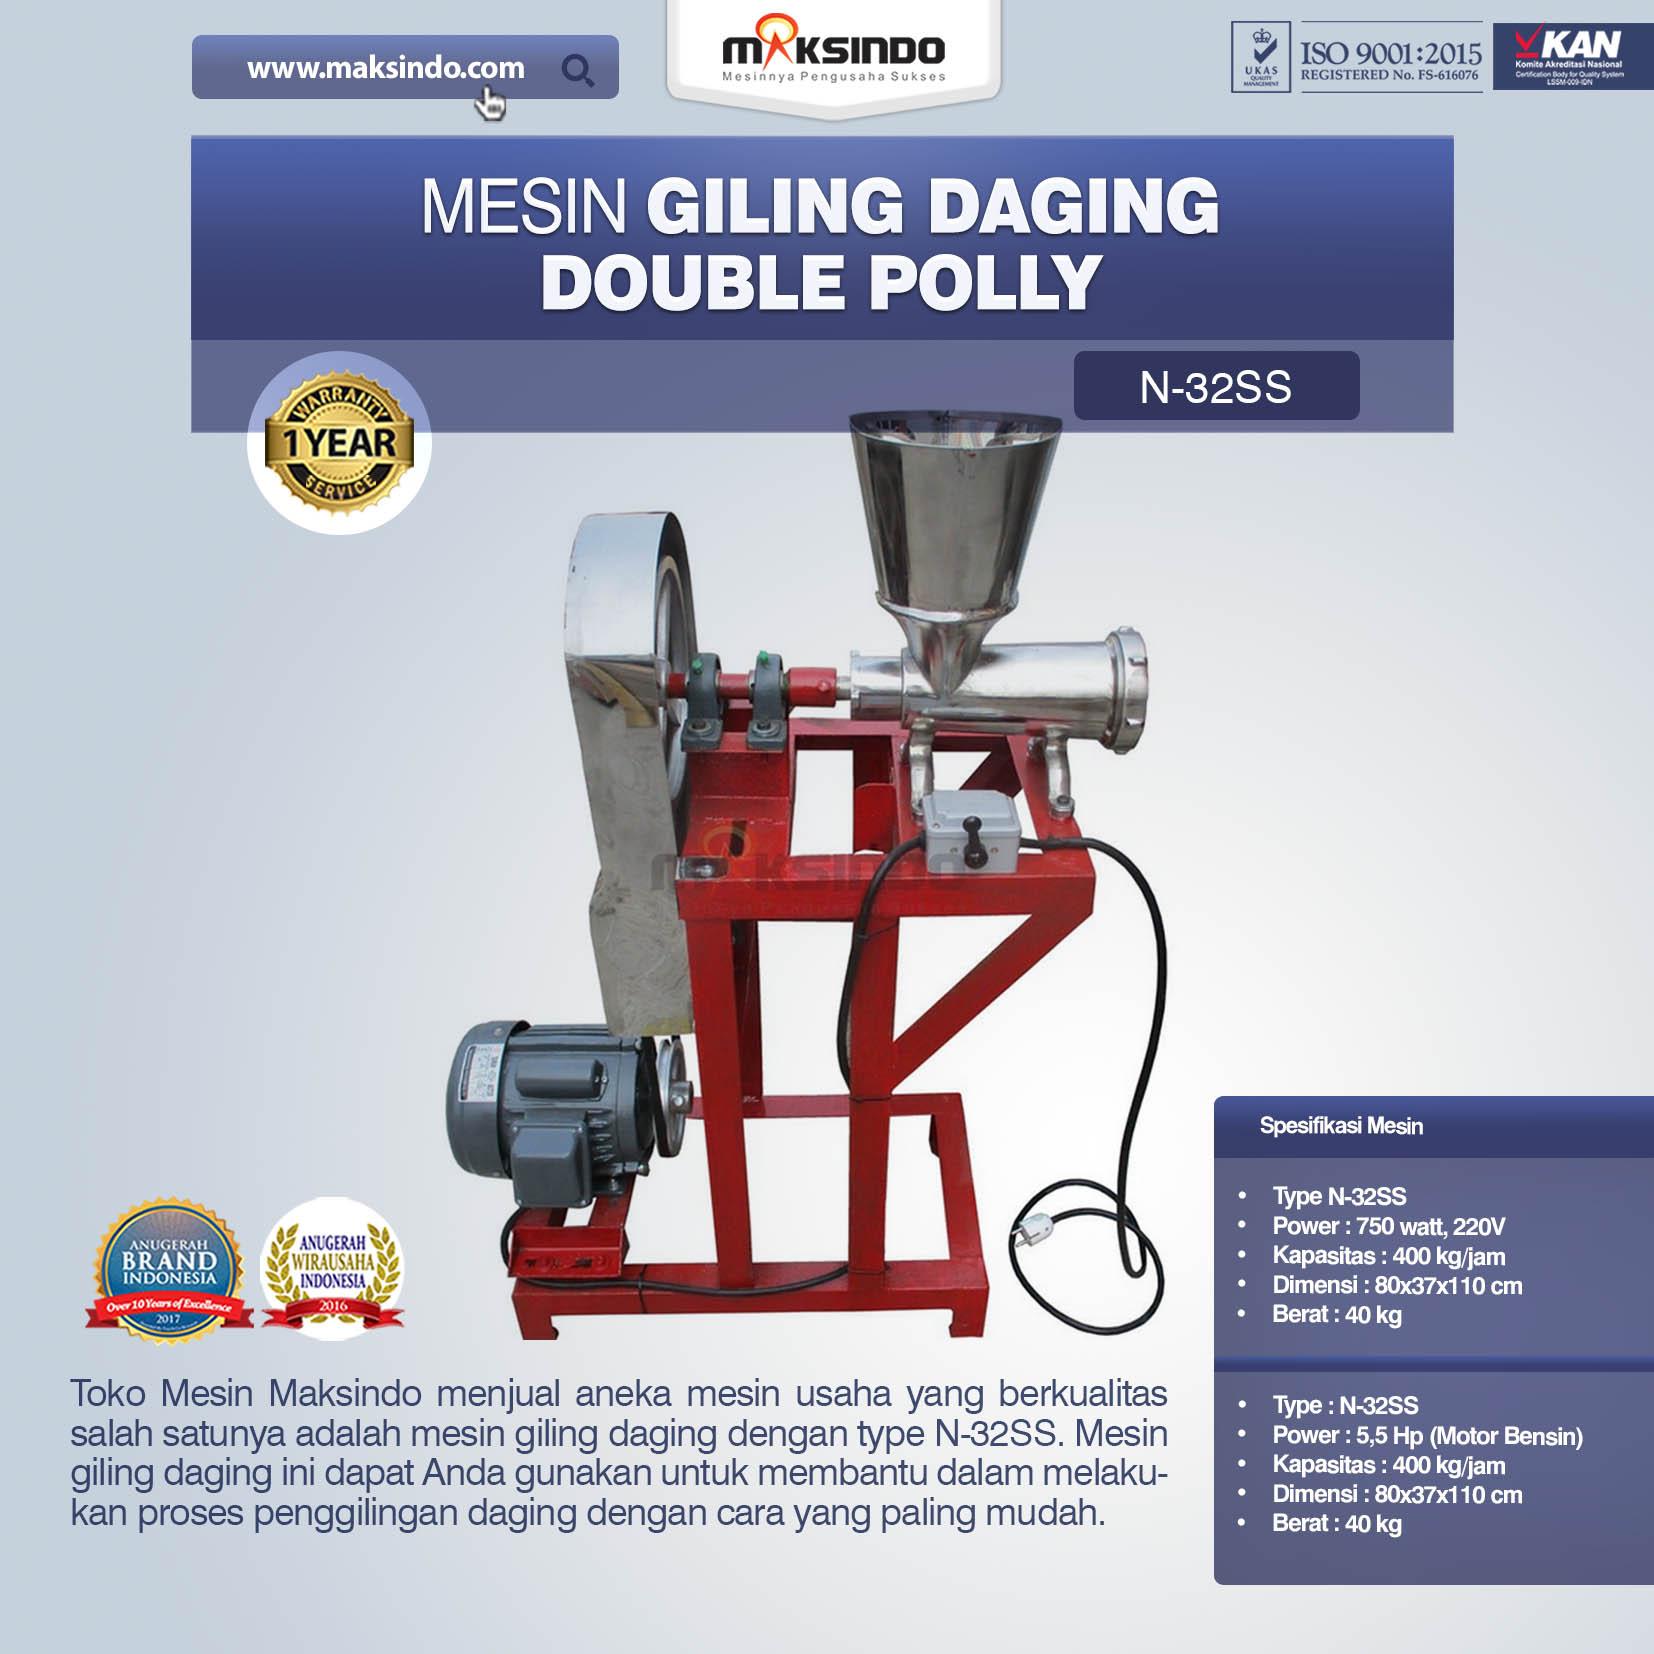 Jual Mesin Giling Daging Double Polly N-32SS di Bandung